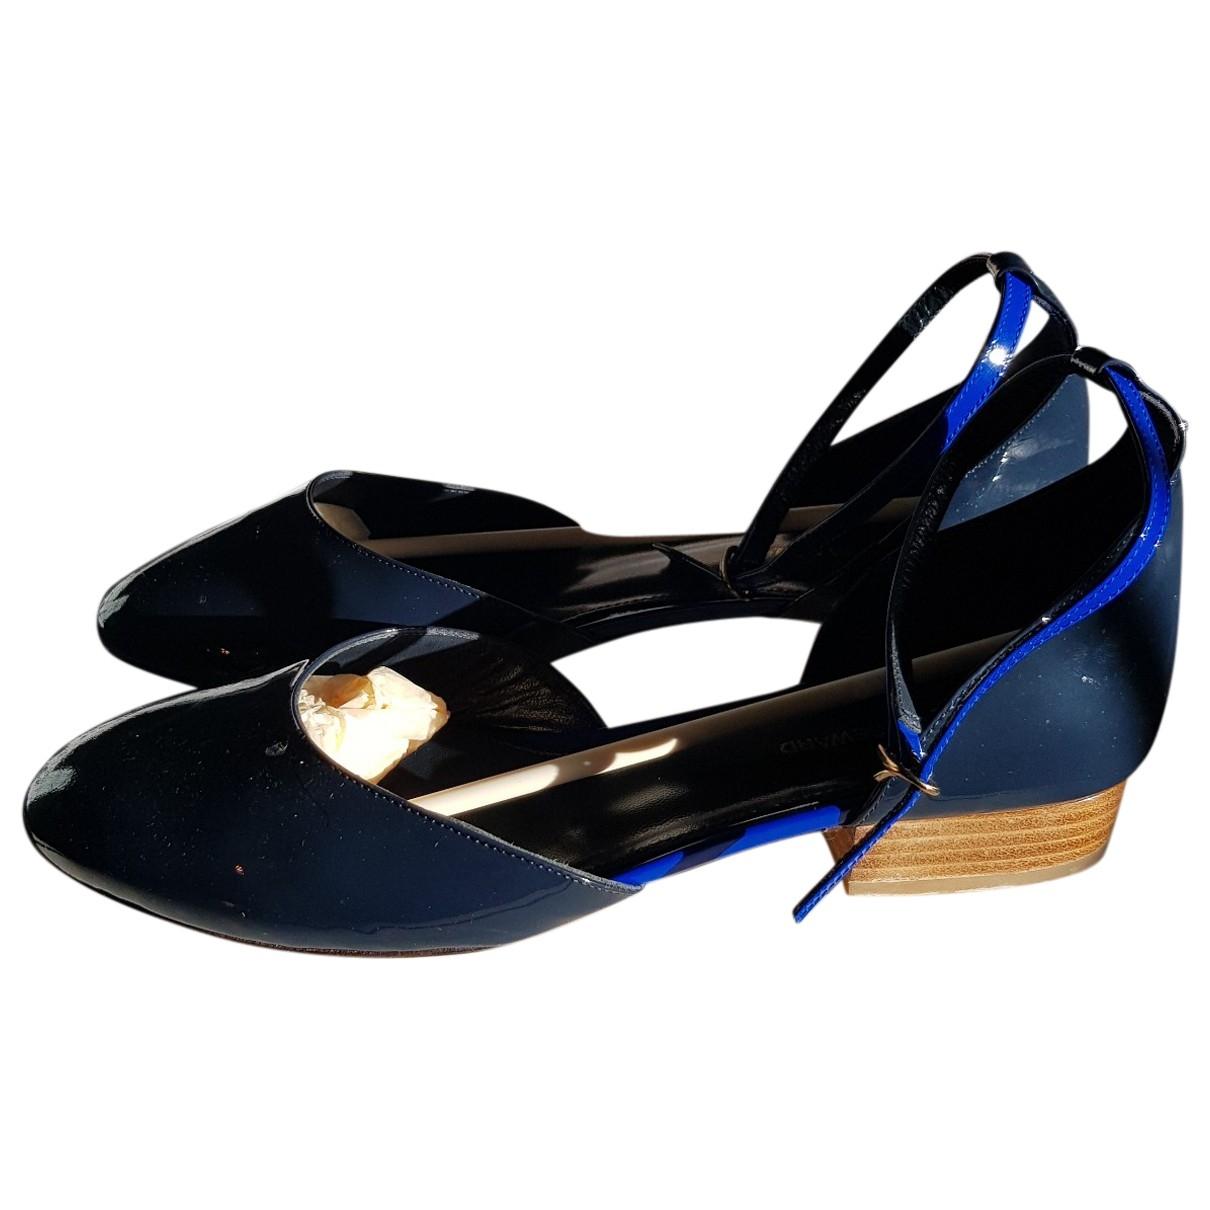 Vanessa Seward \N Black Patent leather Ballet flats for Women 38 EU